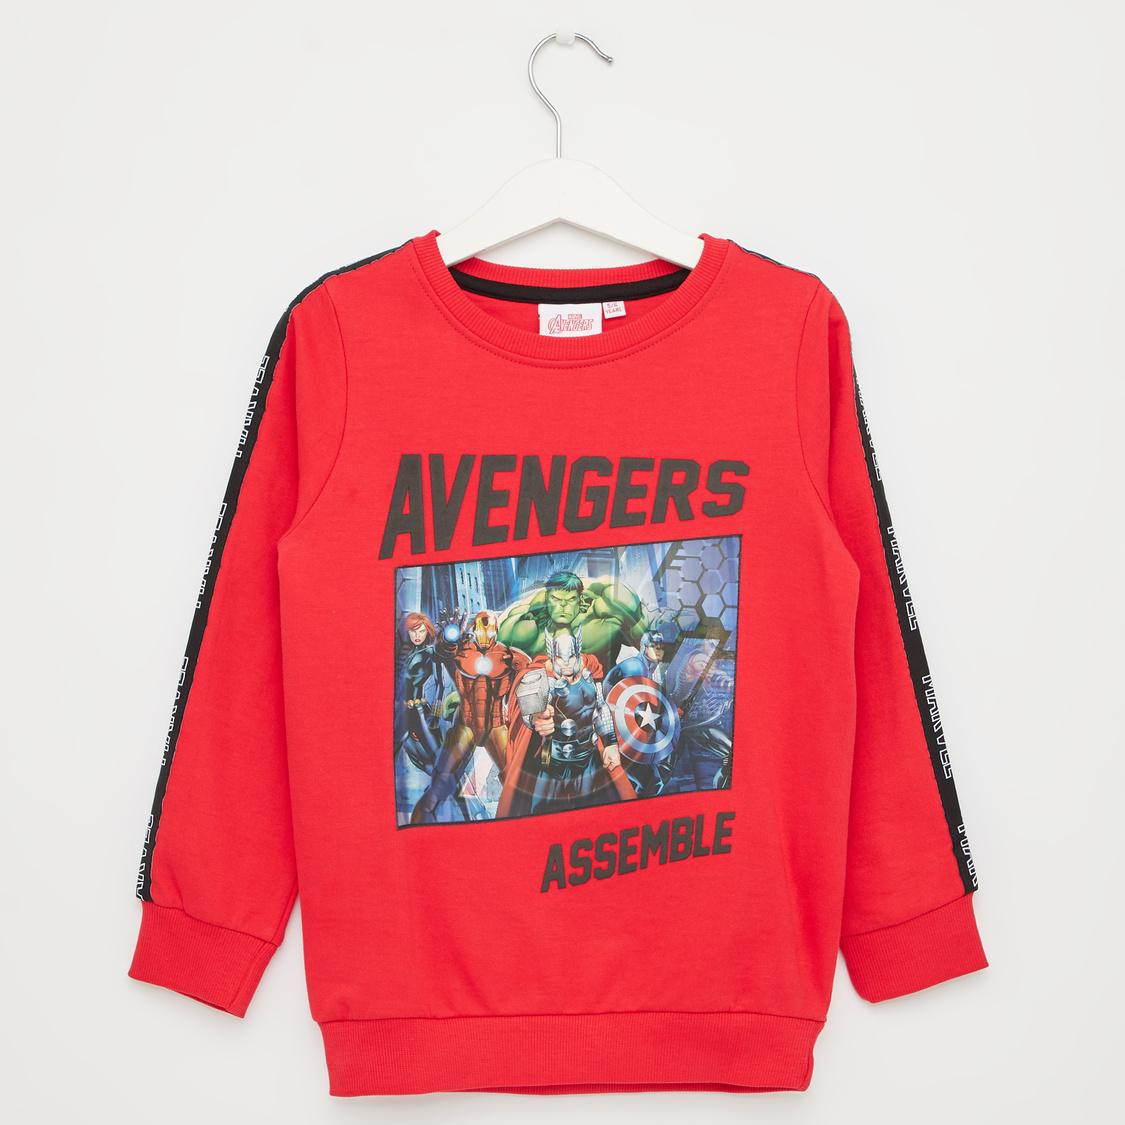 Avengers Print Round Neck Sweatshirt with Long Sleeves